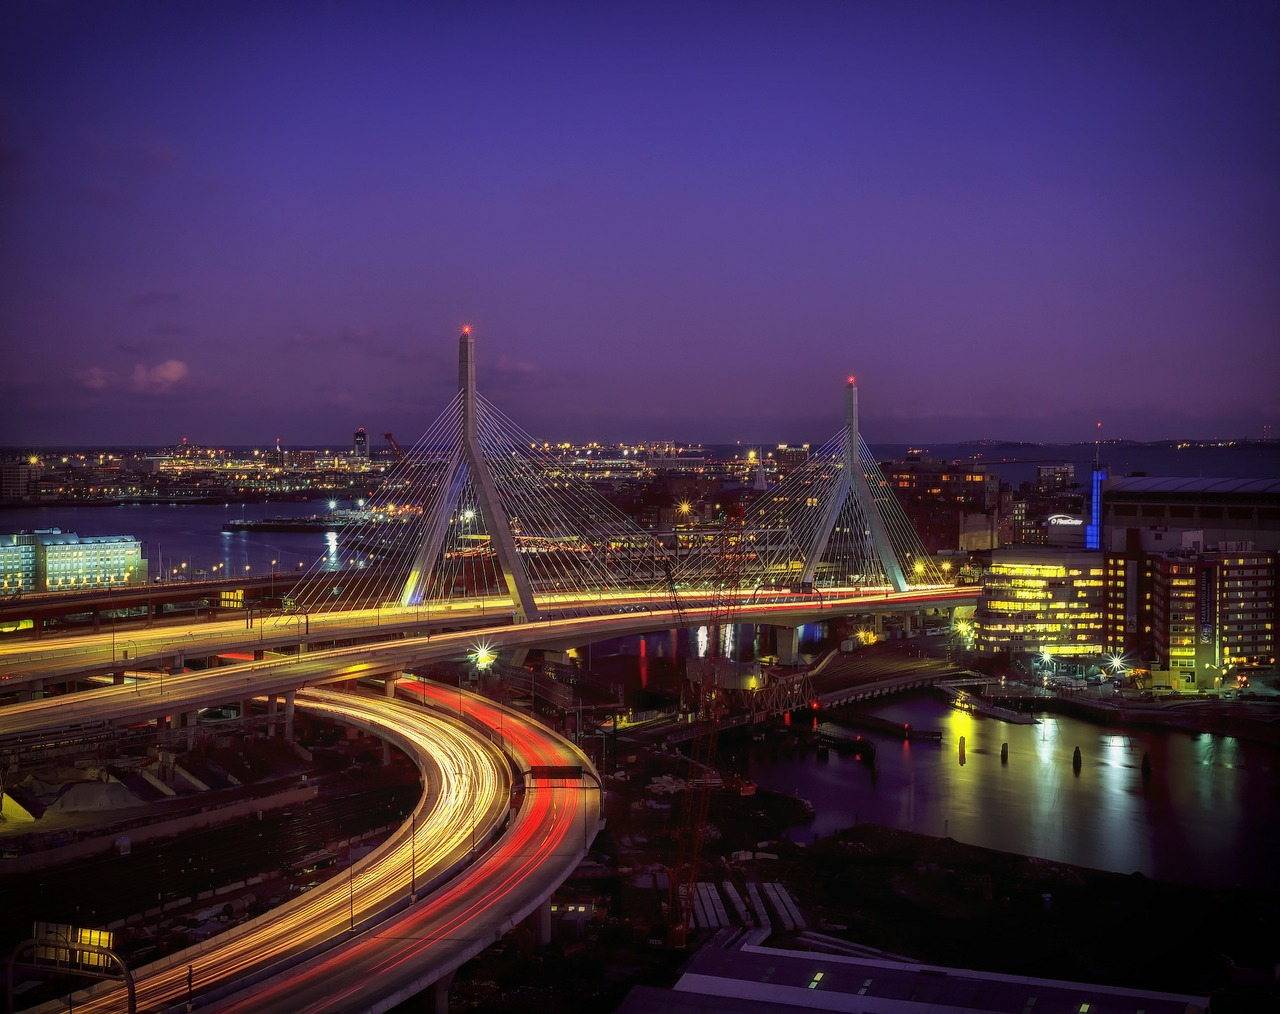 boston-404526_1280 - free_usage_lic